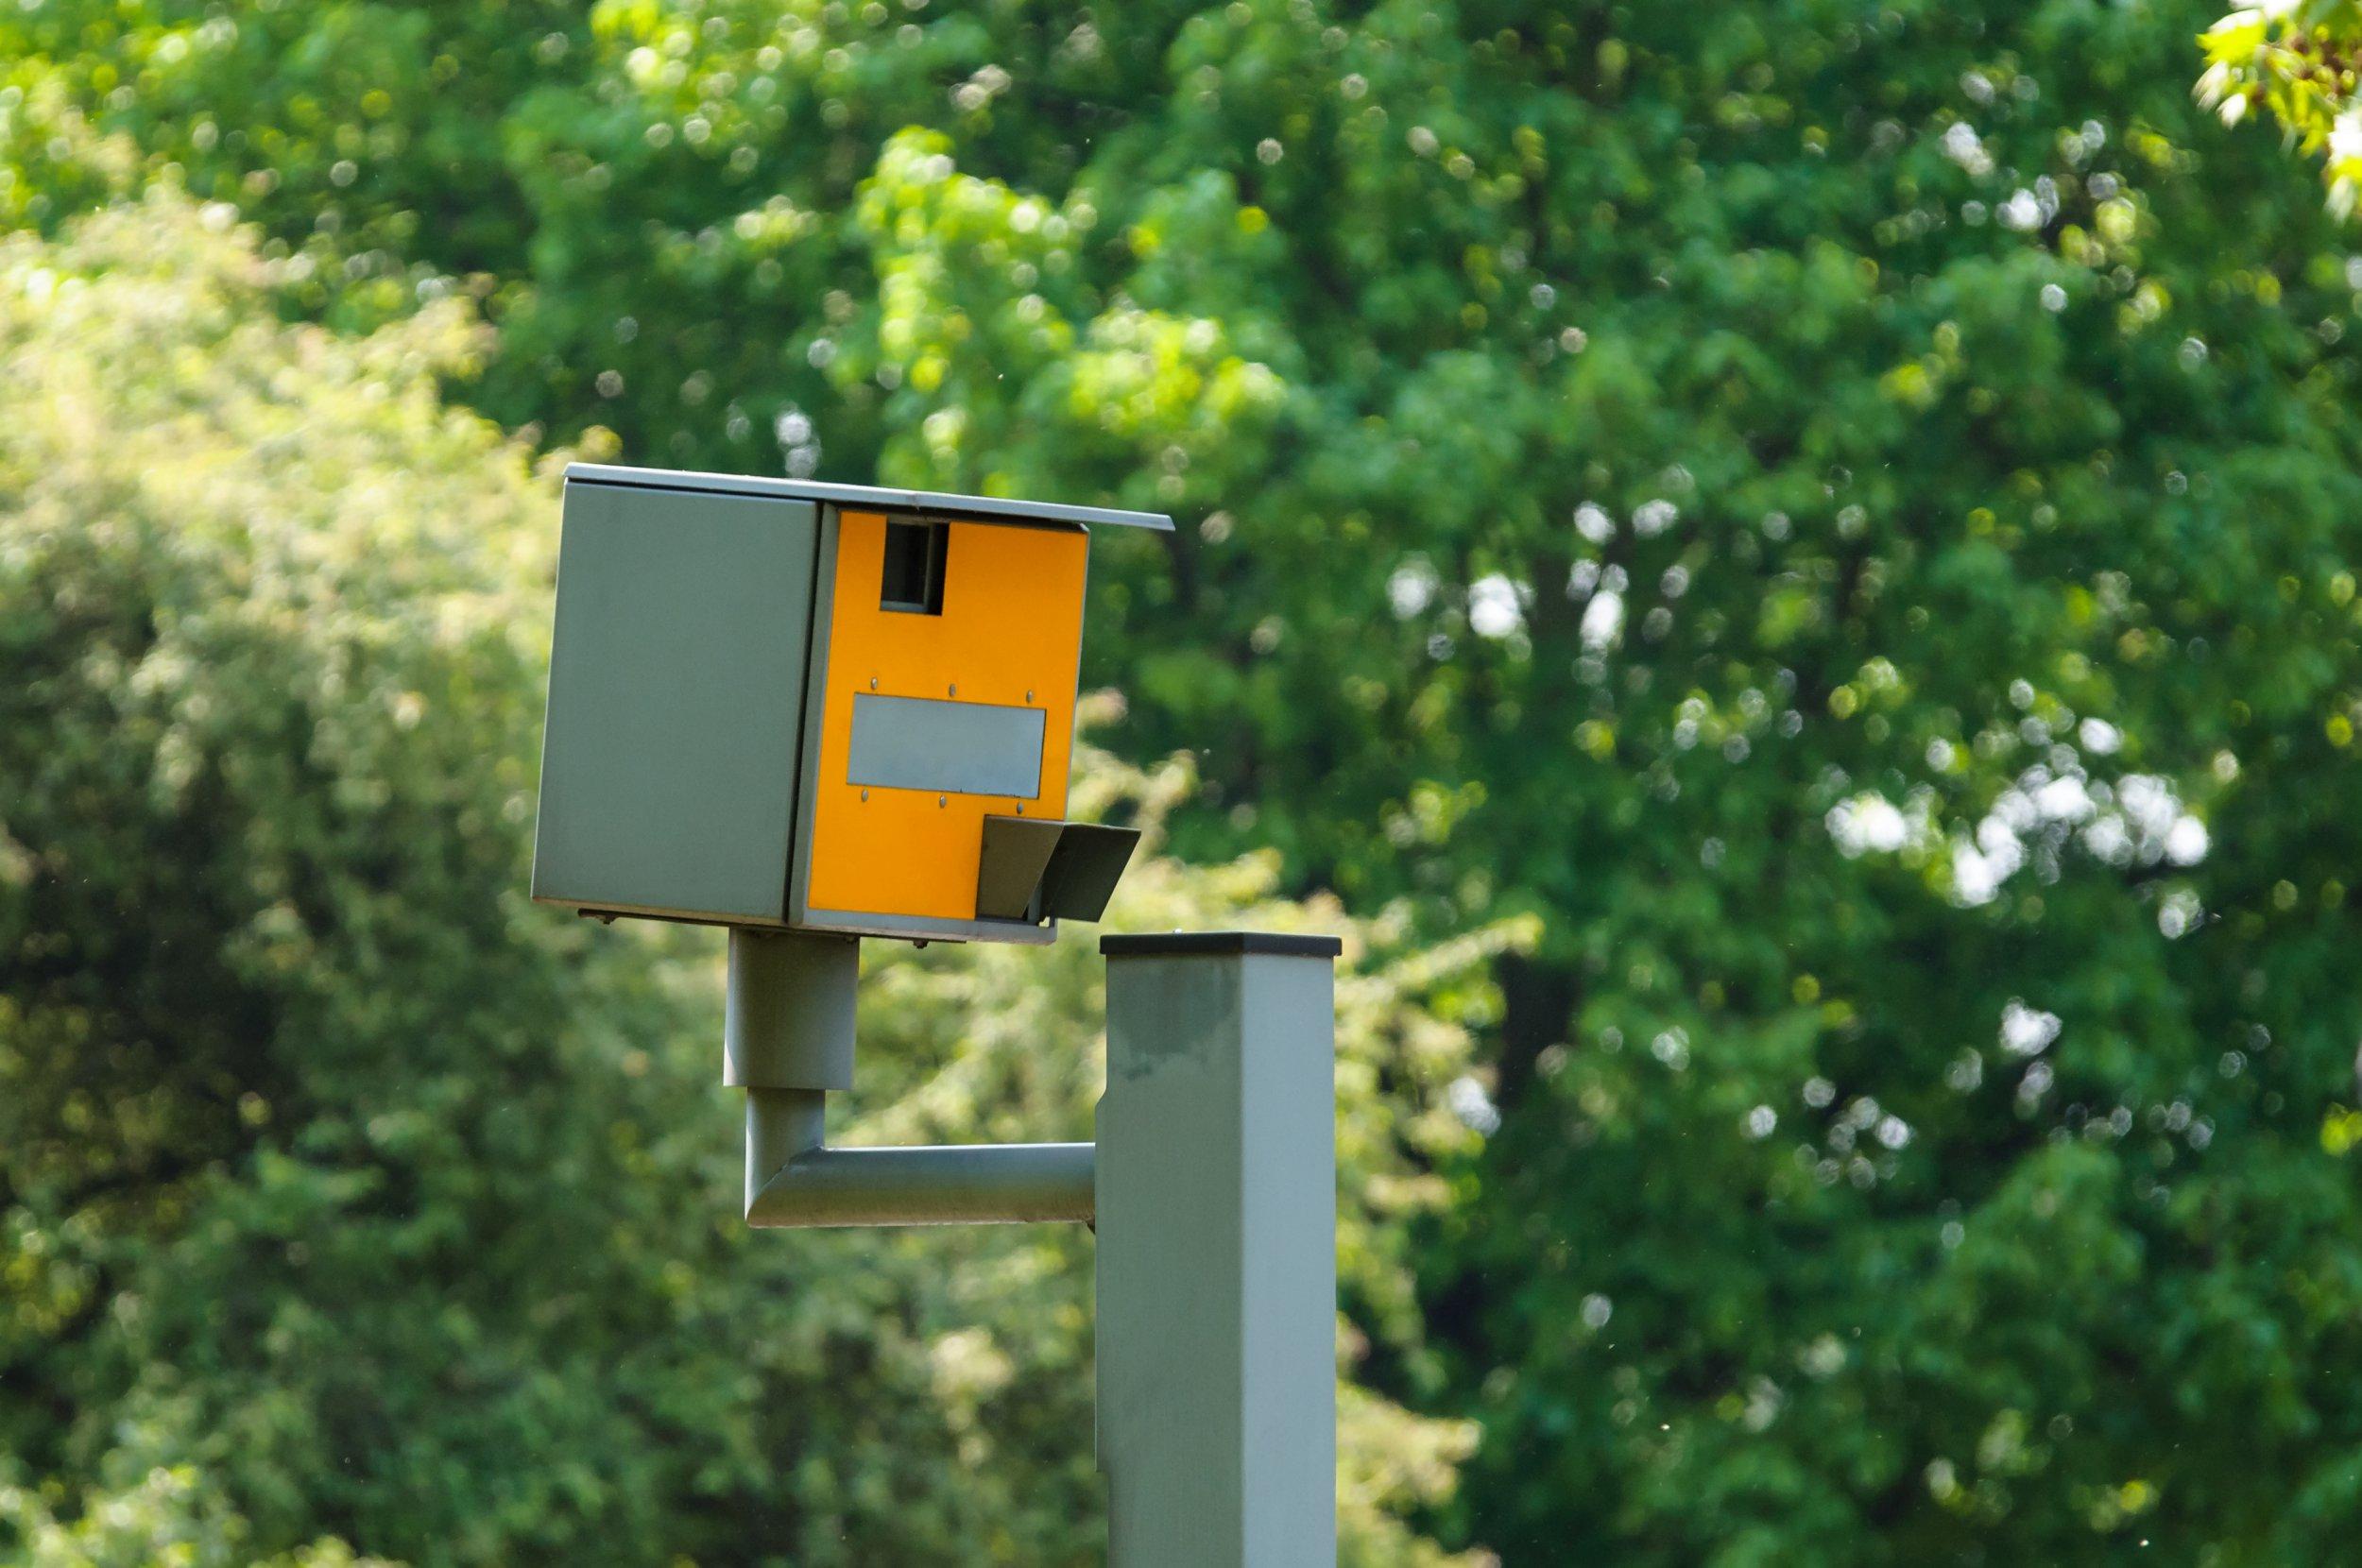 A speed camera in London,UK; Shutterstock ID 412273543; Purchase Order: -